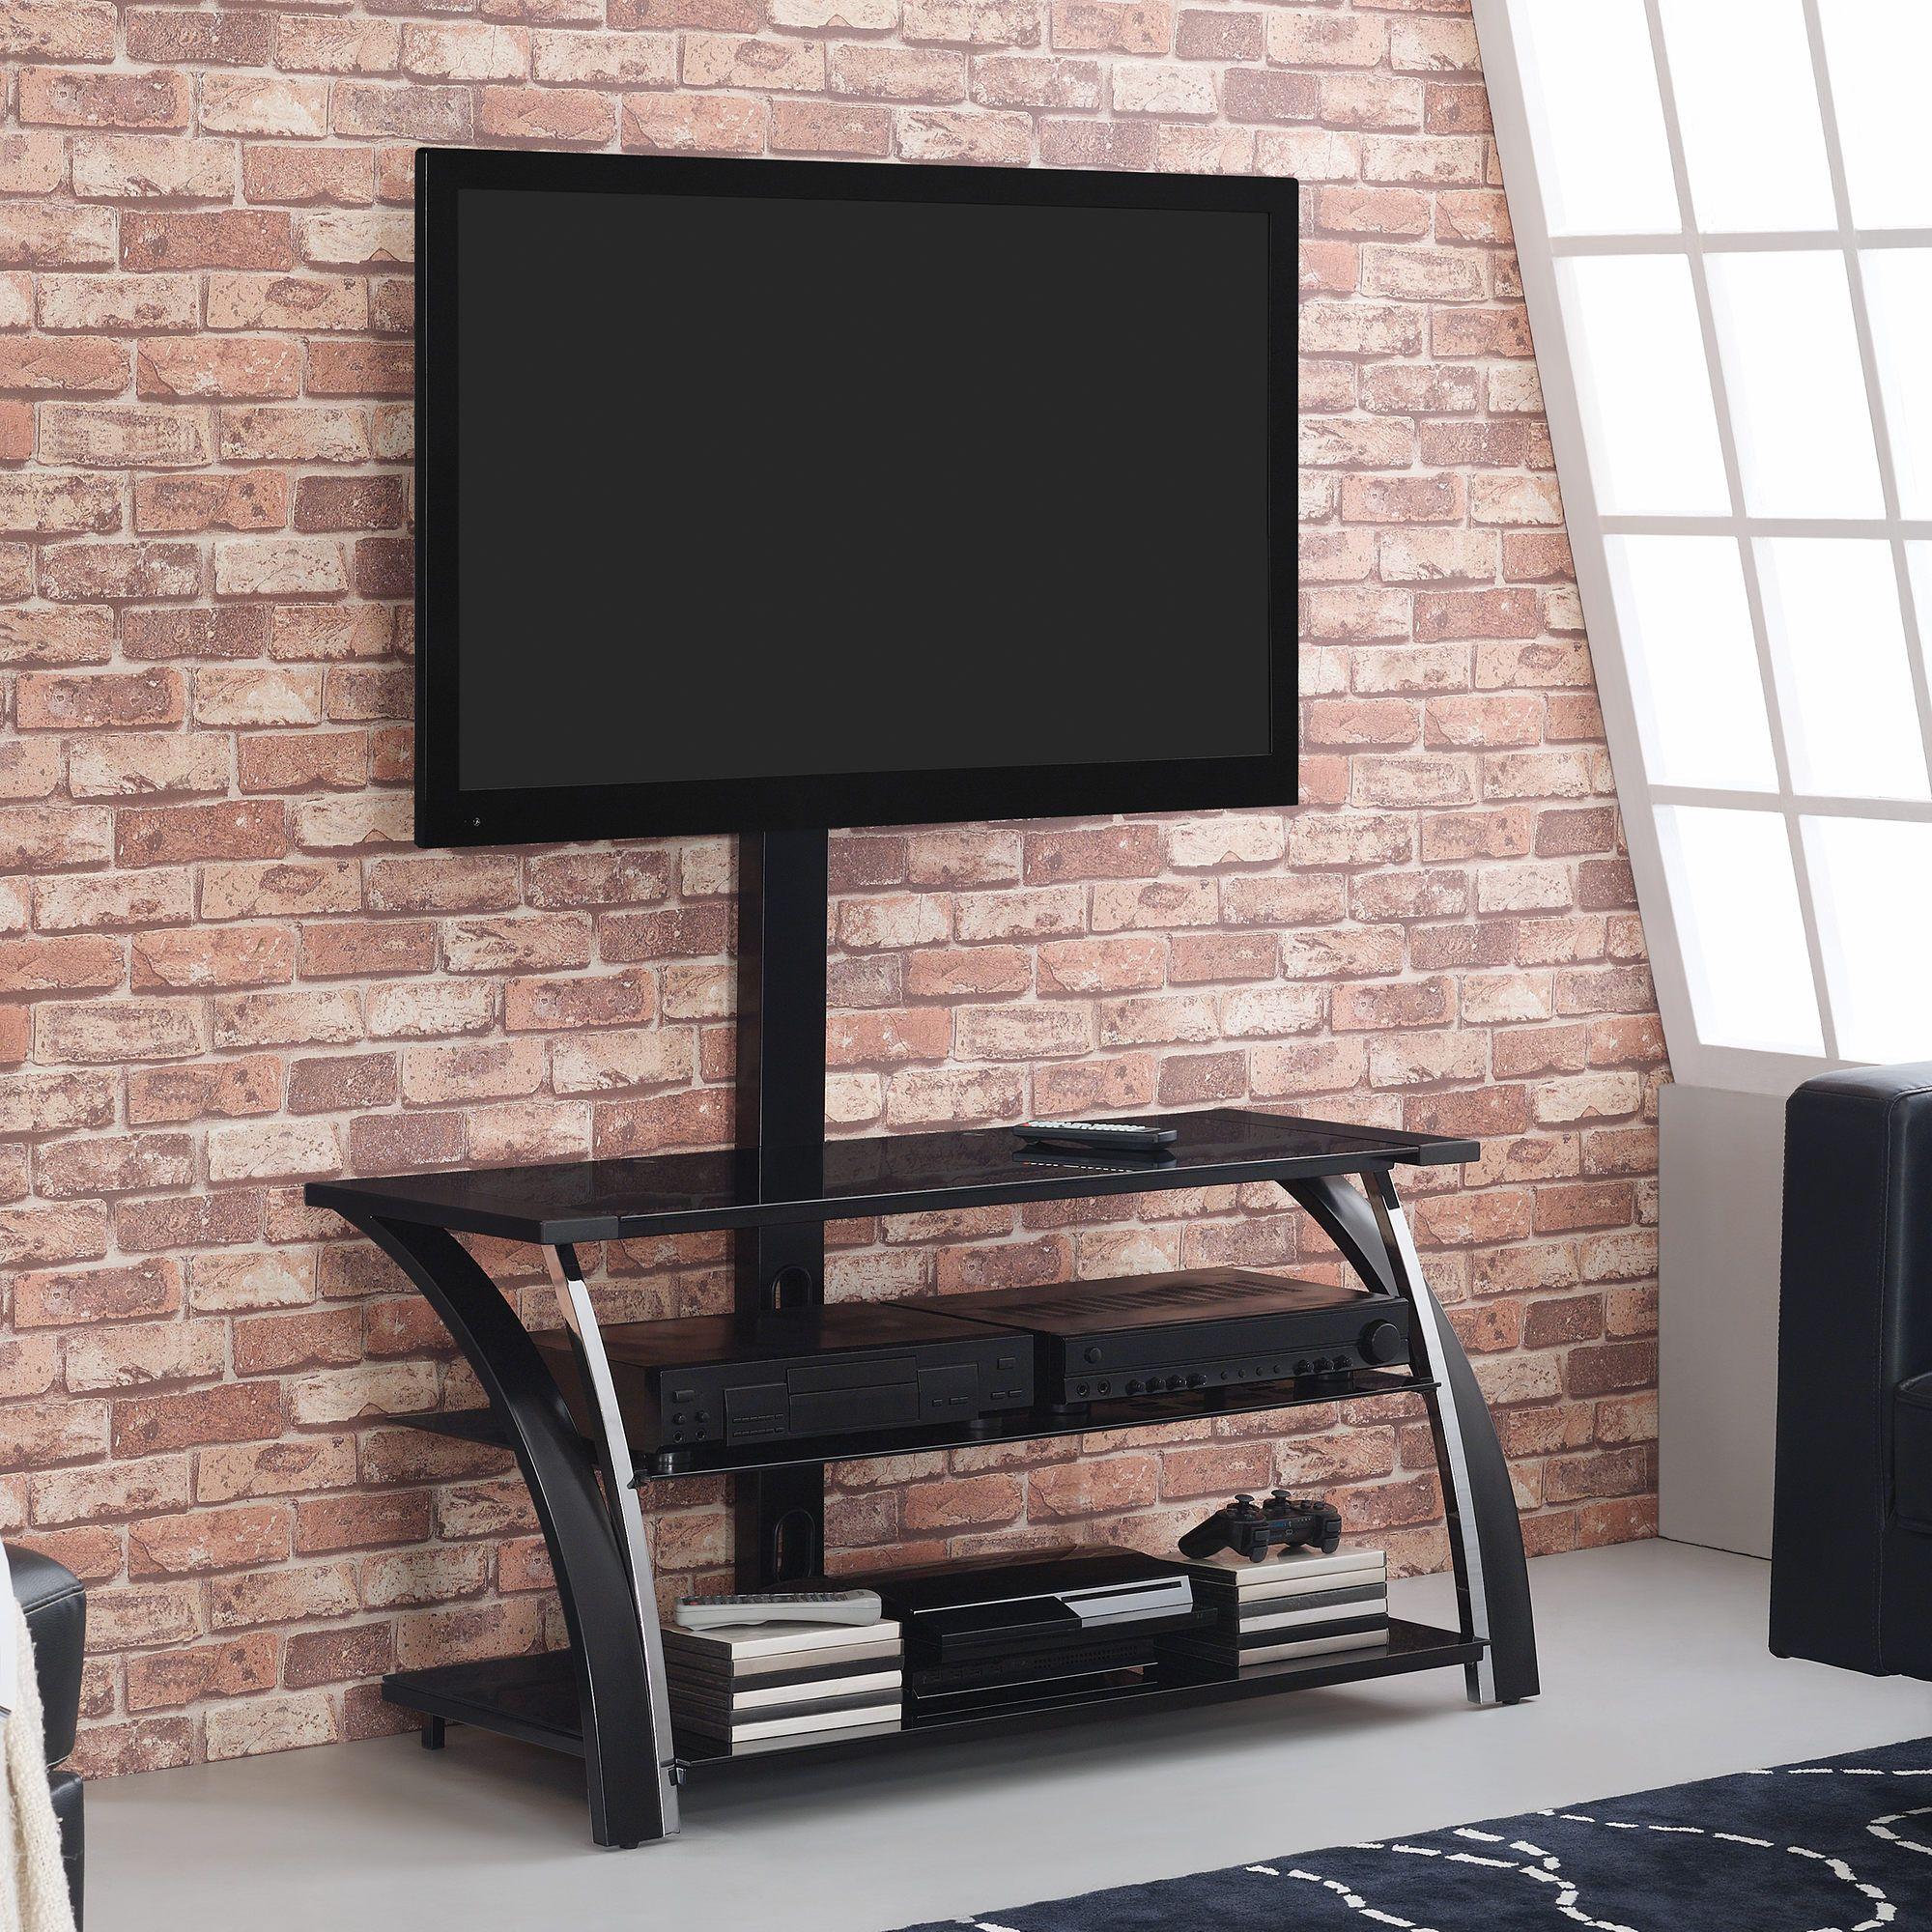 Morganville Btp 3344 The Patriot Tv Stand Dream Home Swivel Tv